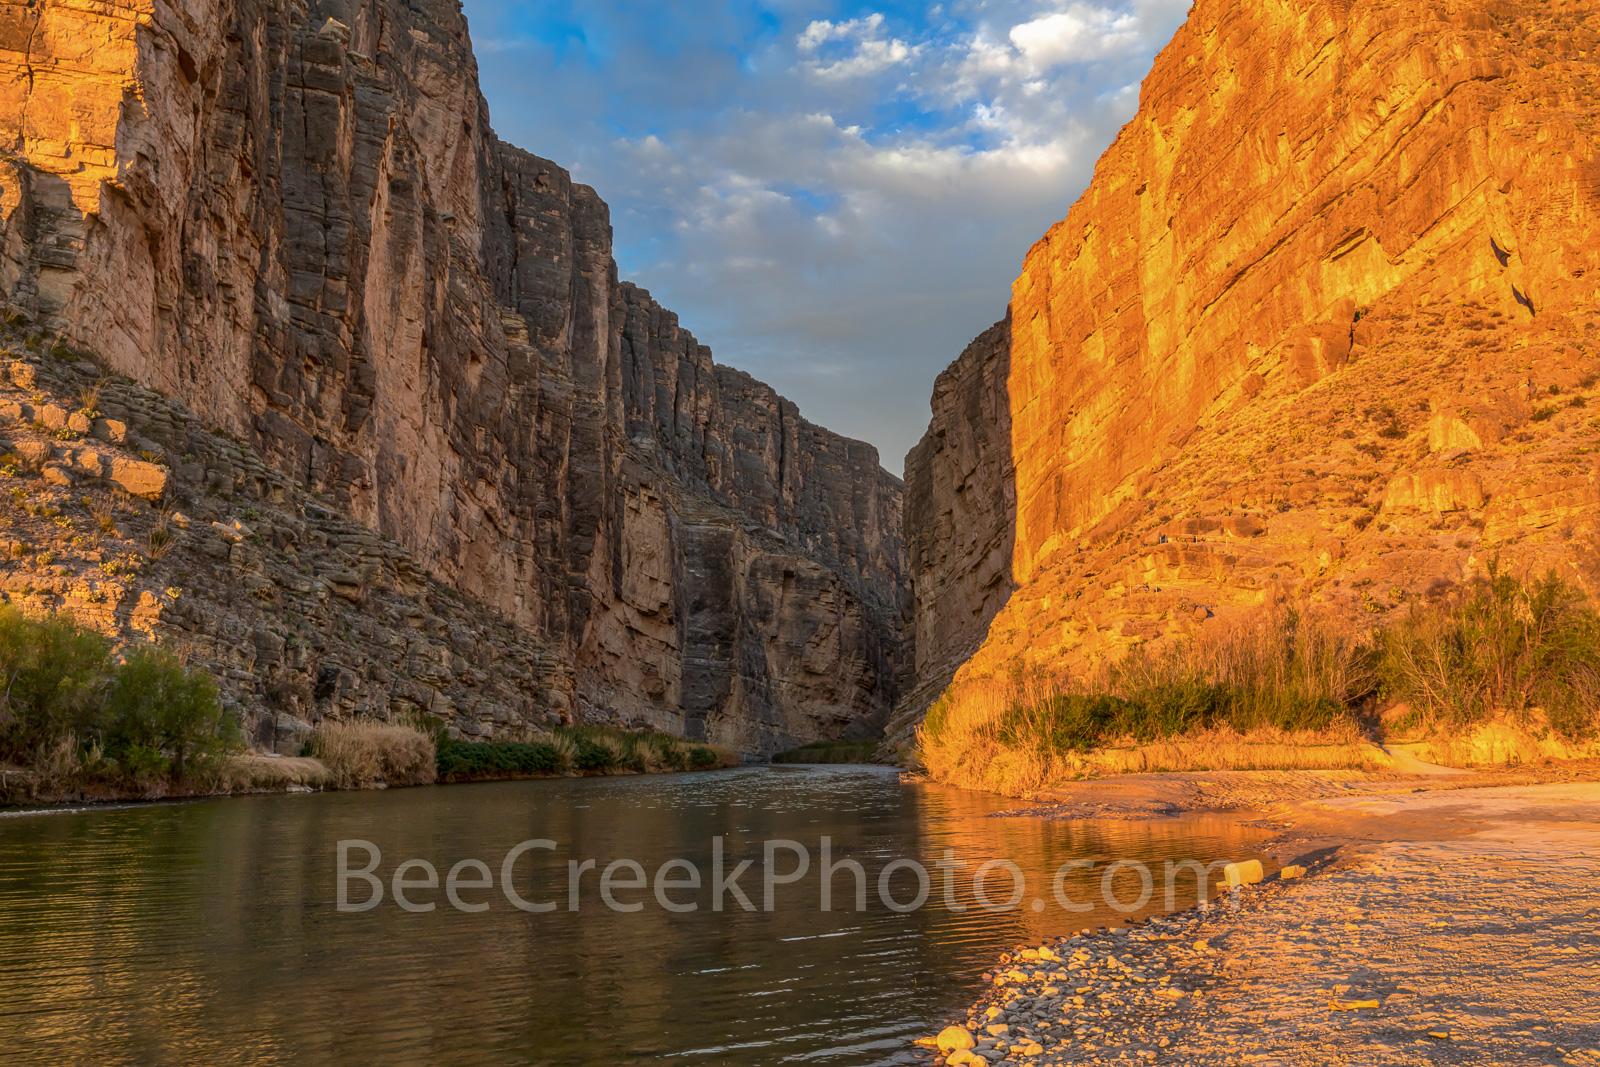 Santa Elena Canyon Glow, sunrise, glow, Big bend national park, texas landscape, river rocks, blue sky, nice clouds, canyons, rocks, down stream, coast, mountains, Mexico, canyons, Santa Elena Canyon,, photo